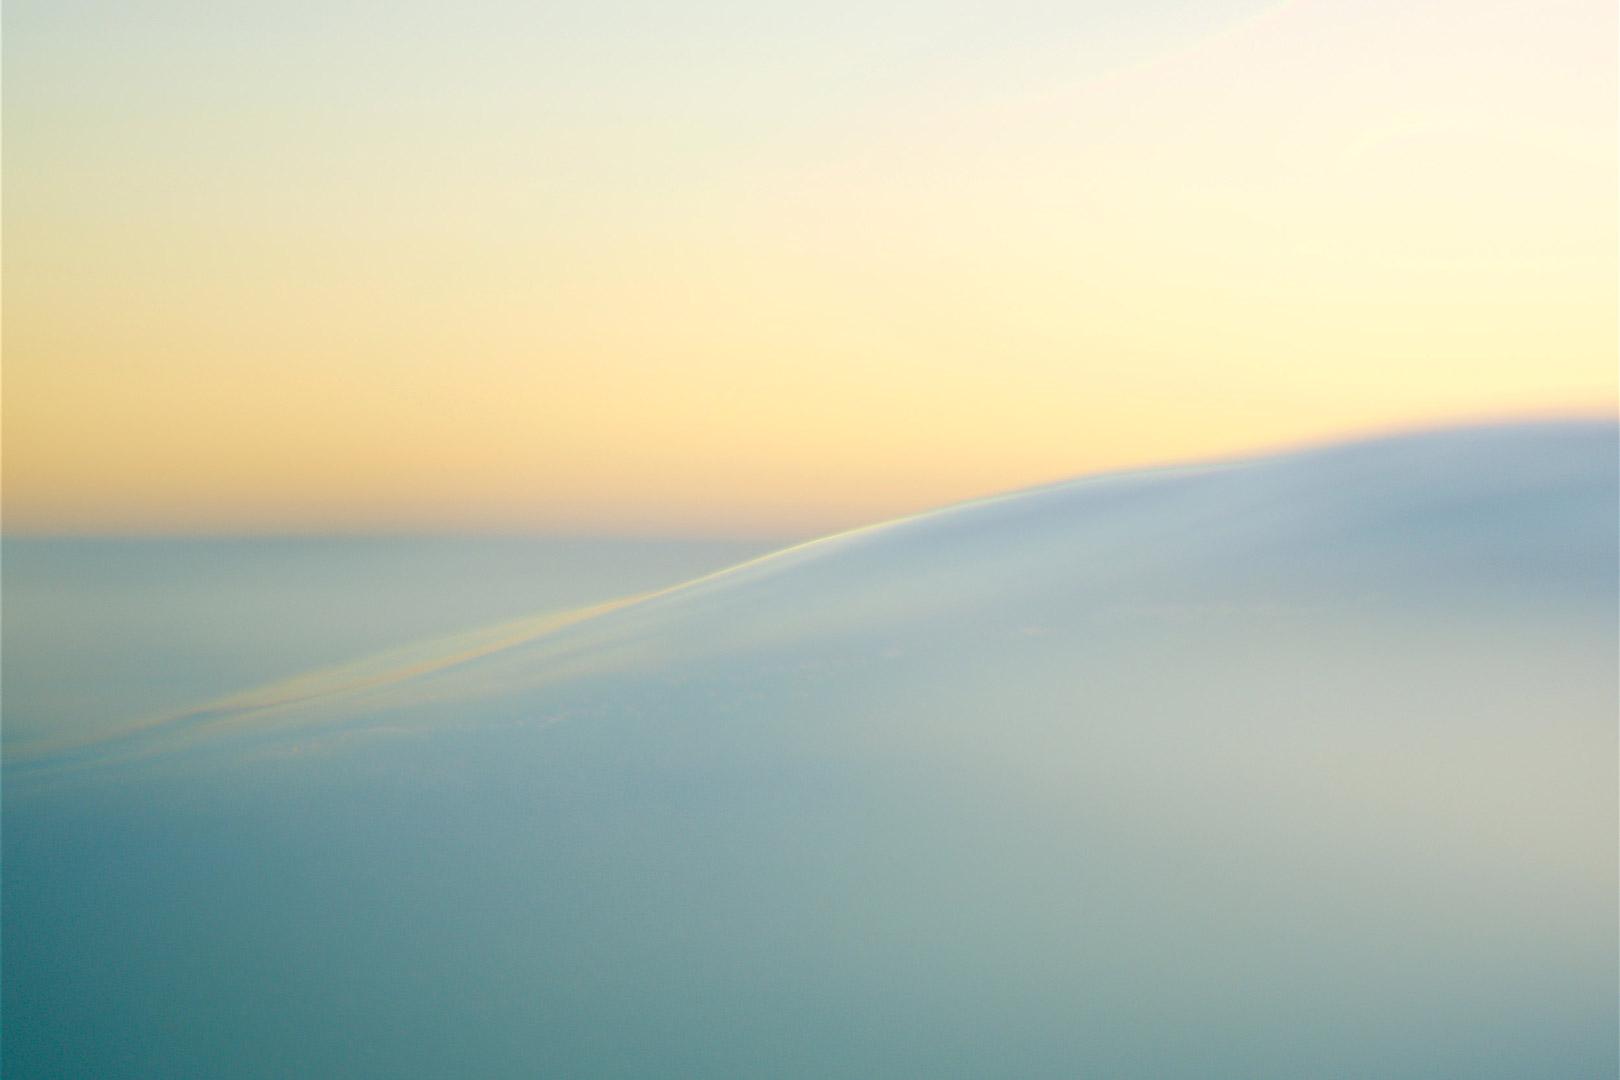 OCEAN SEASCAPE PHOTOGRAPHY Fine art ocean photography 'sealevel' #5